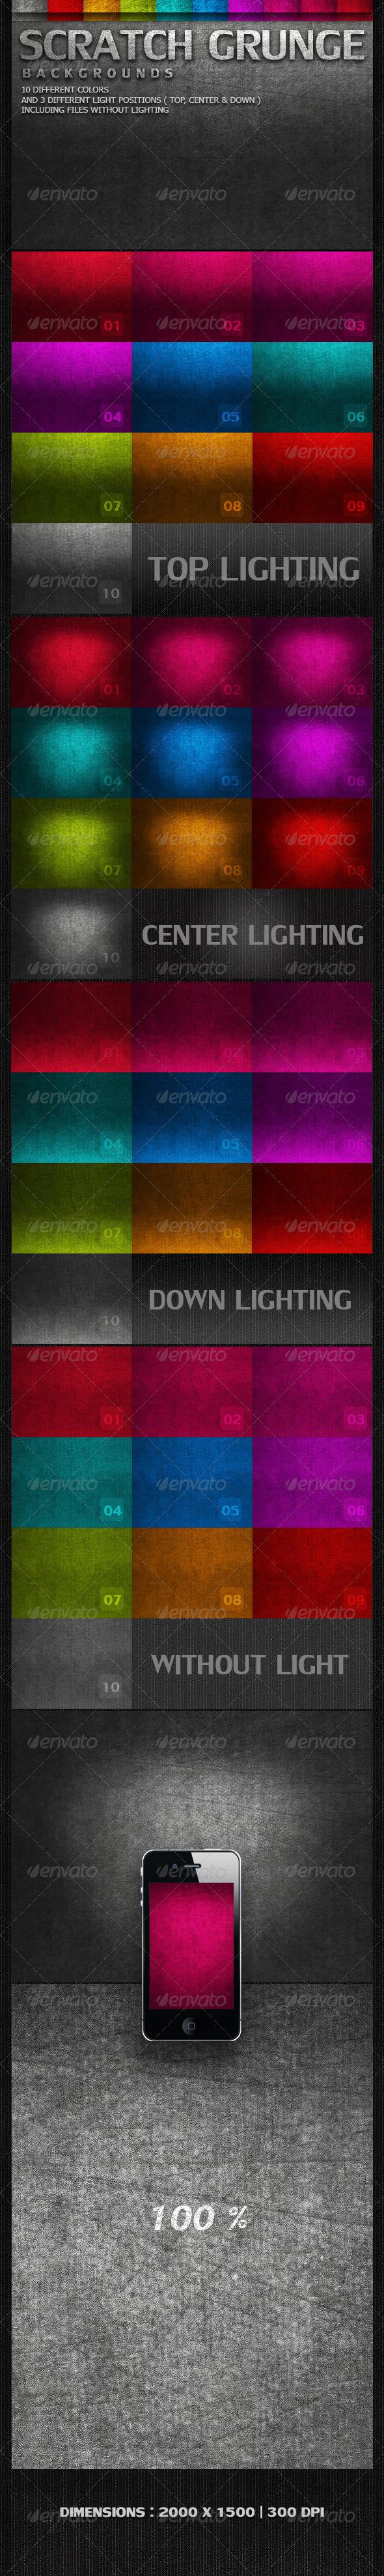 Scratch Grunge Backgrounds